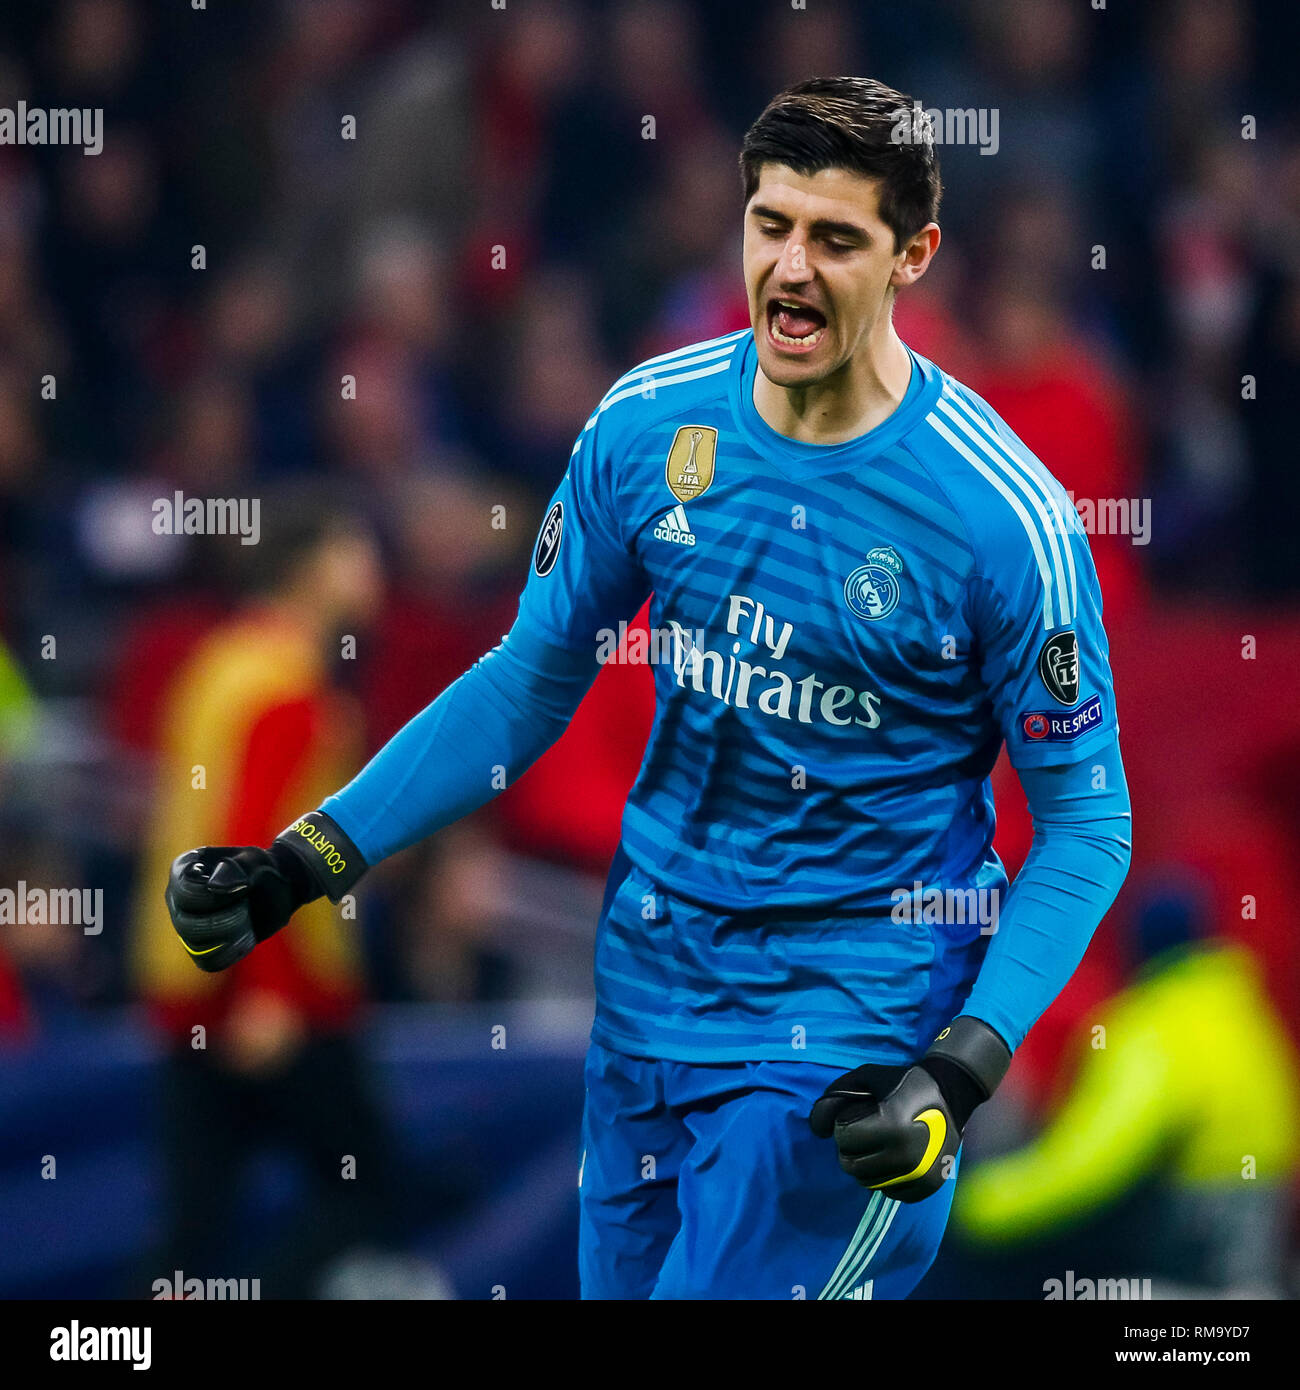 Portero Real Madrid Imágenes De Stock & Portero Real Madrid